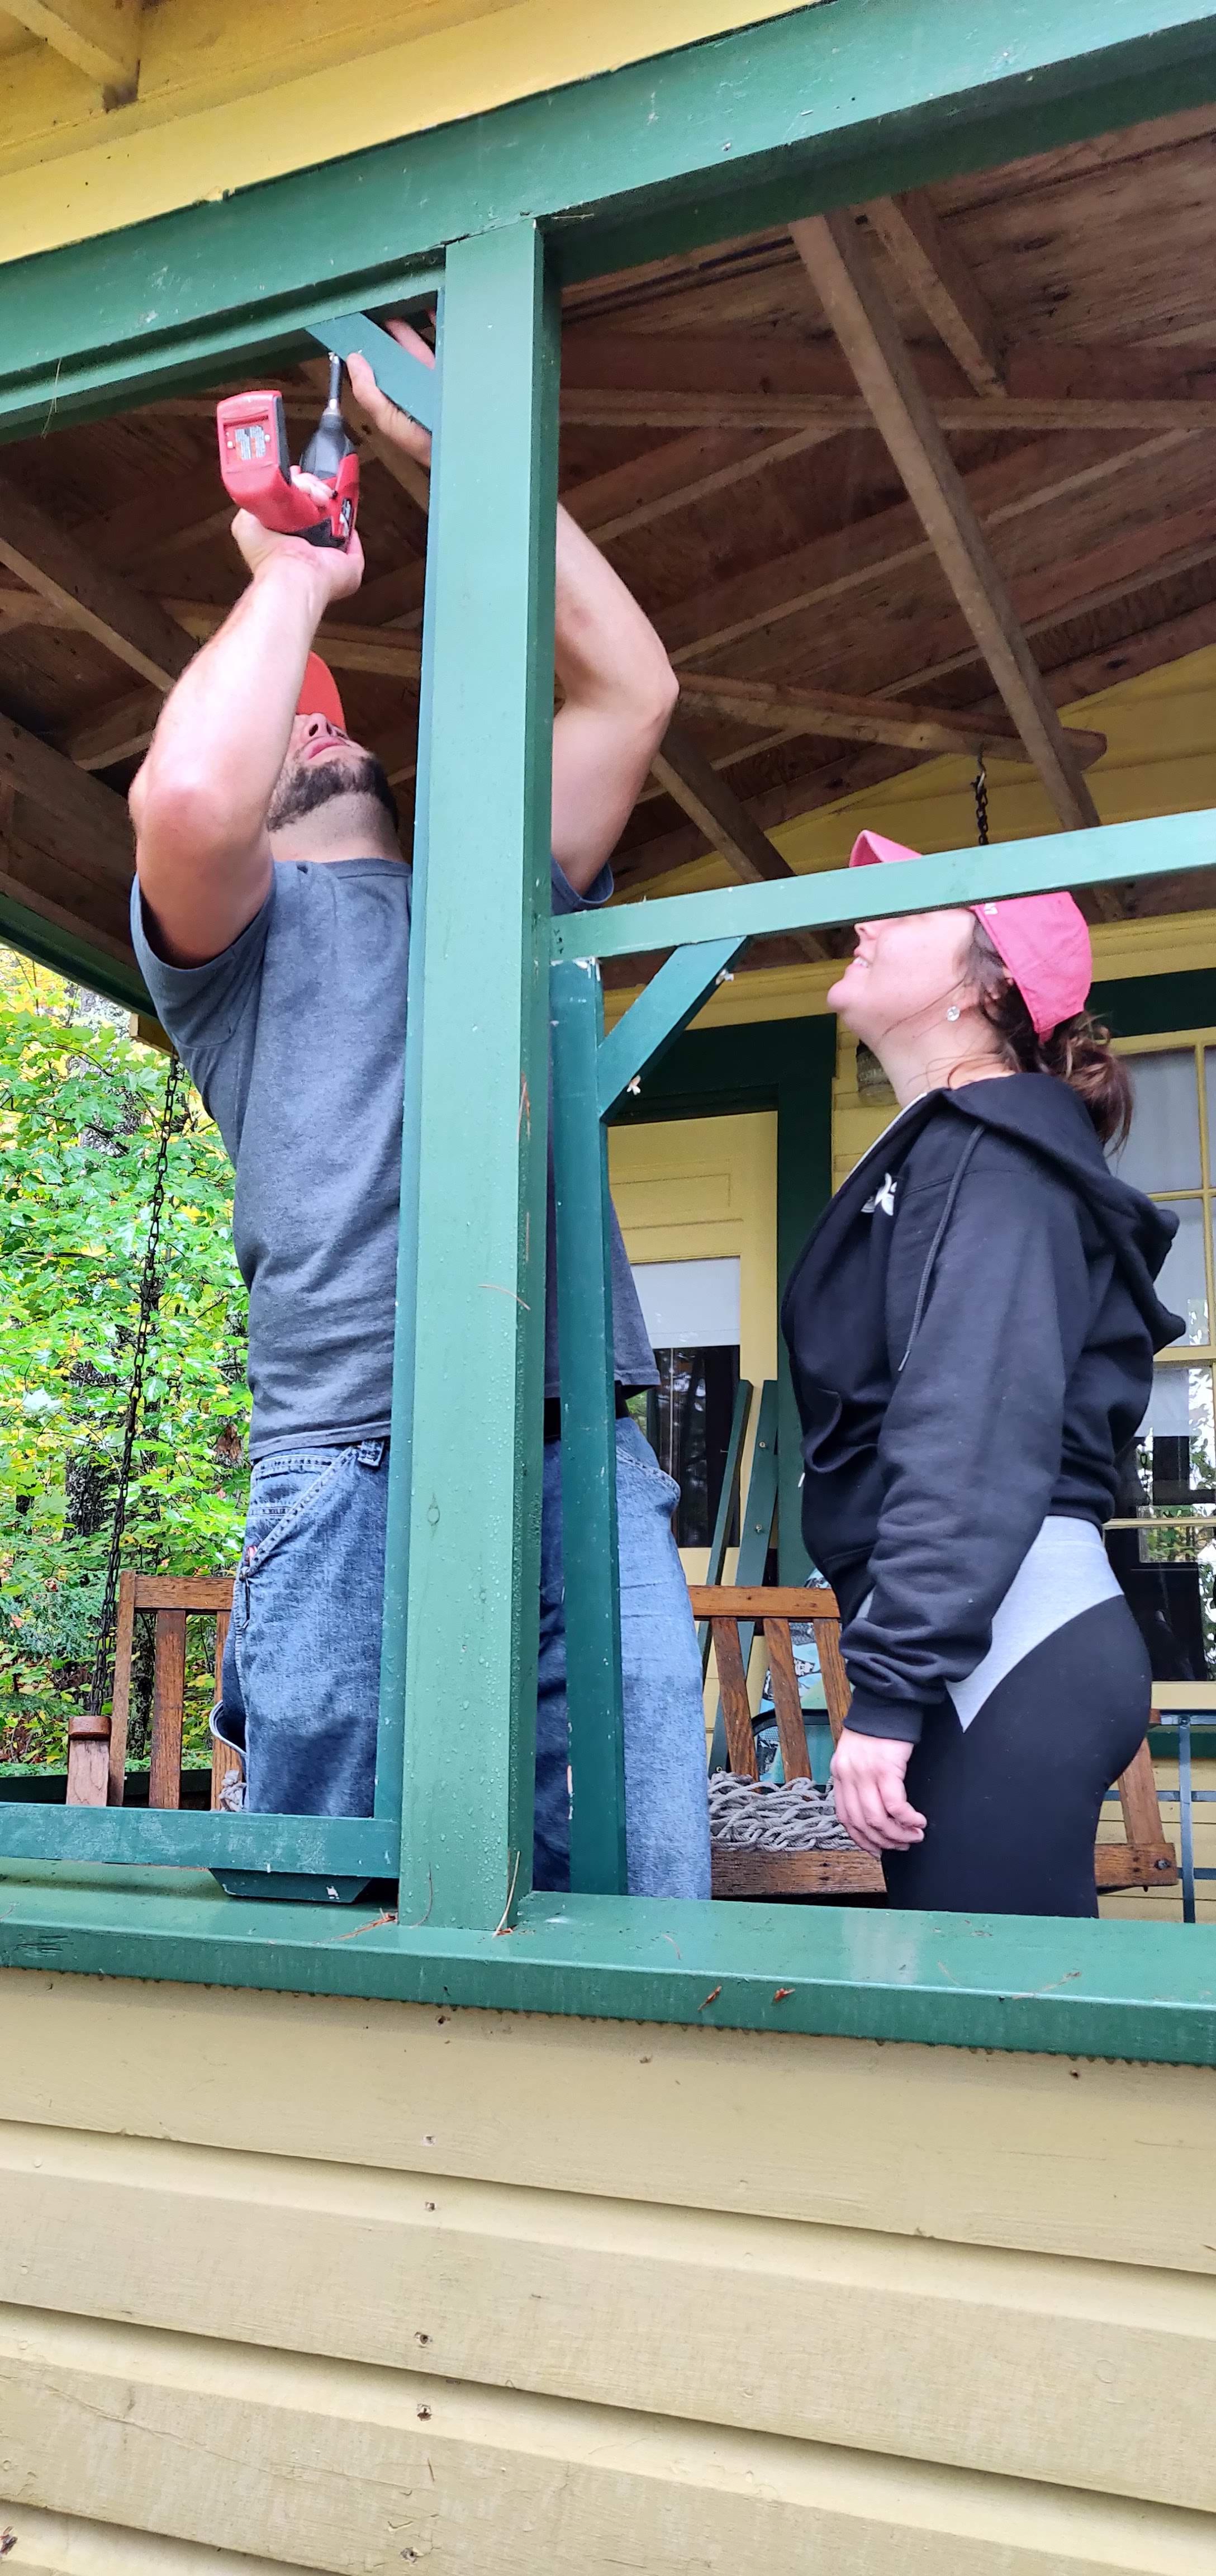 Emily and Joe assembling frames for the winter shutters.